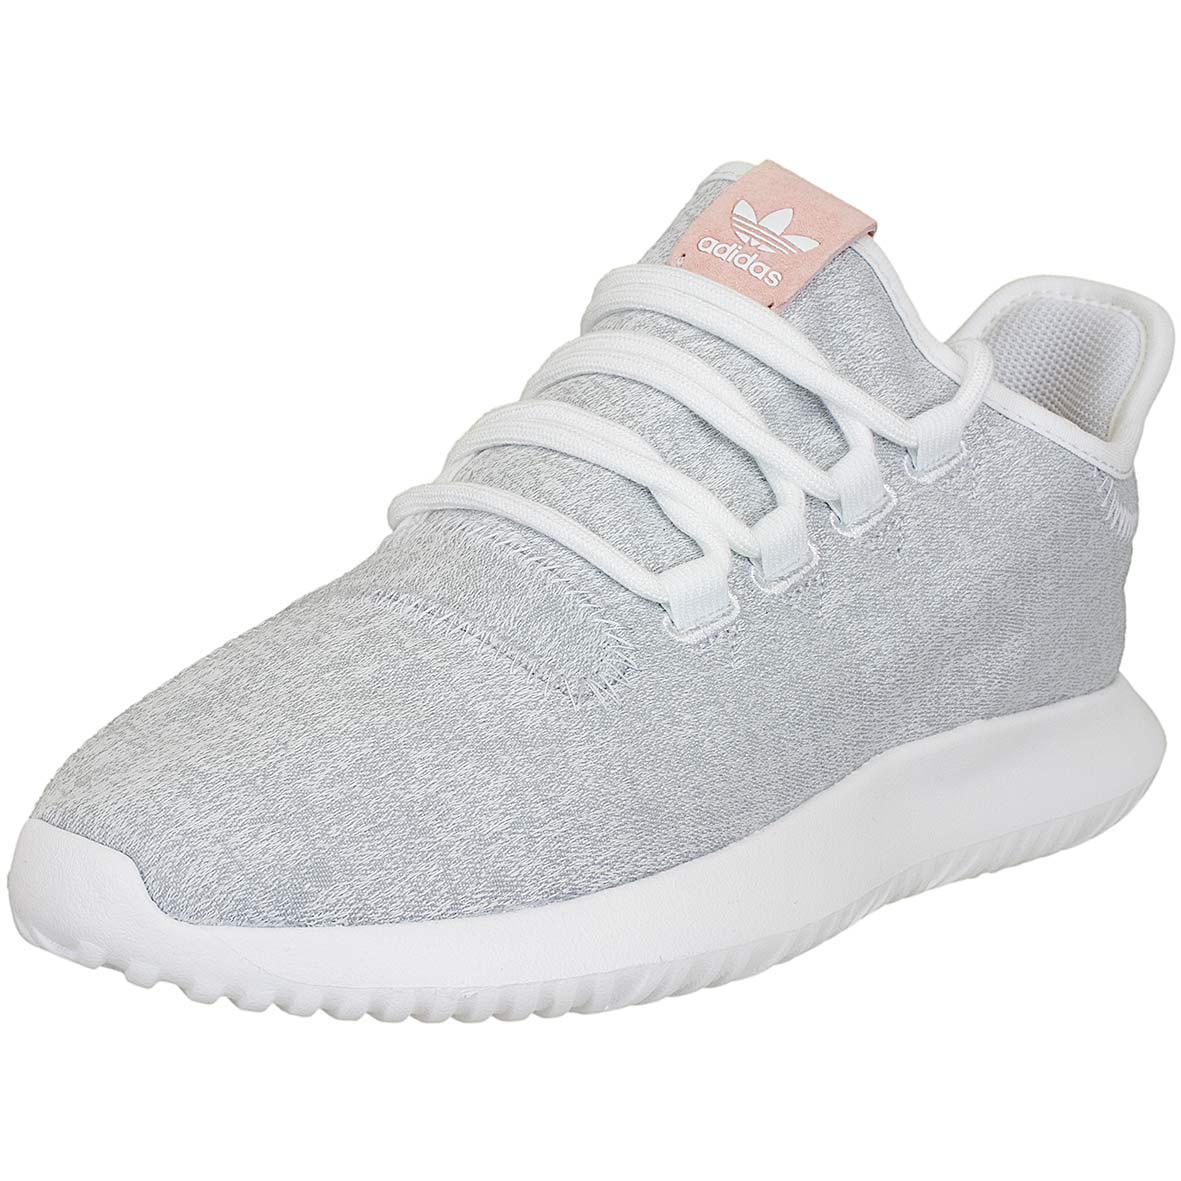 adidas damen sneakers tubular shadow